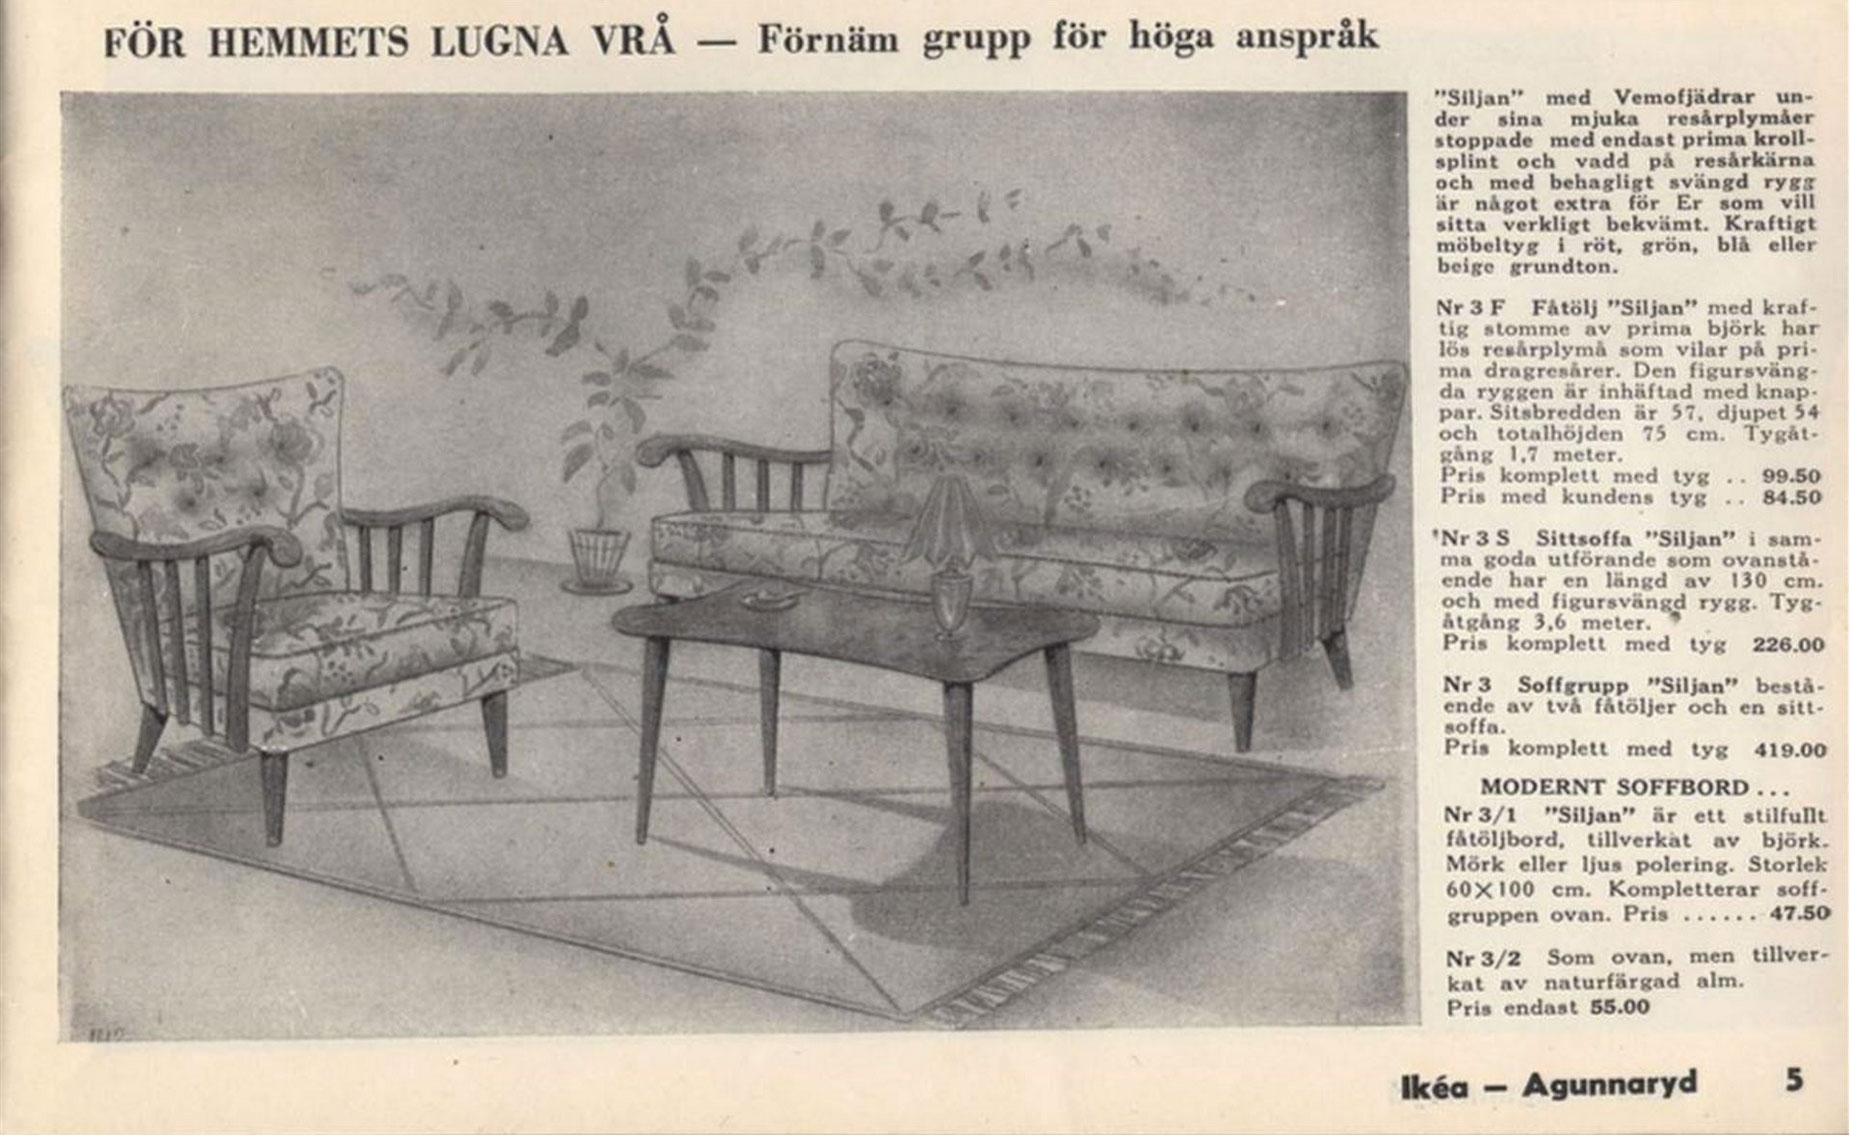 Ikea-katalog från 1951